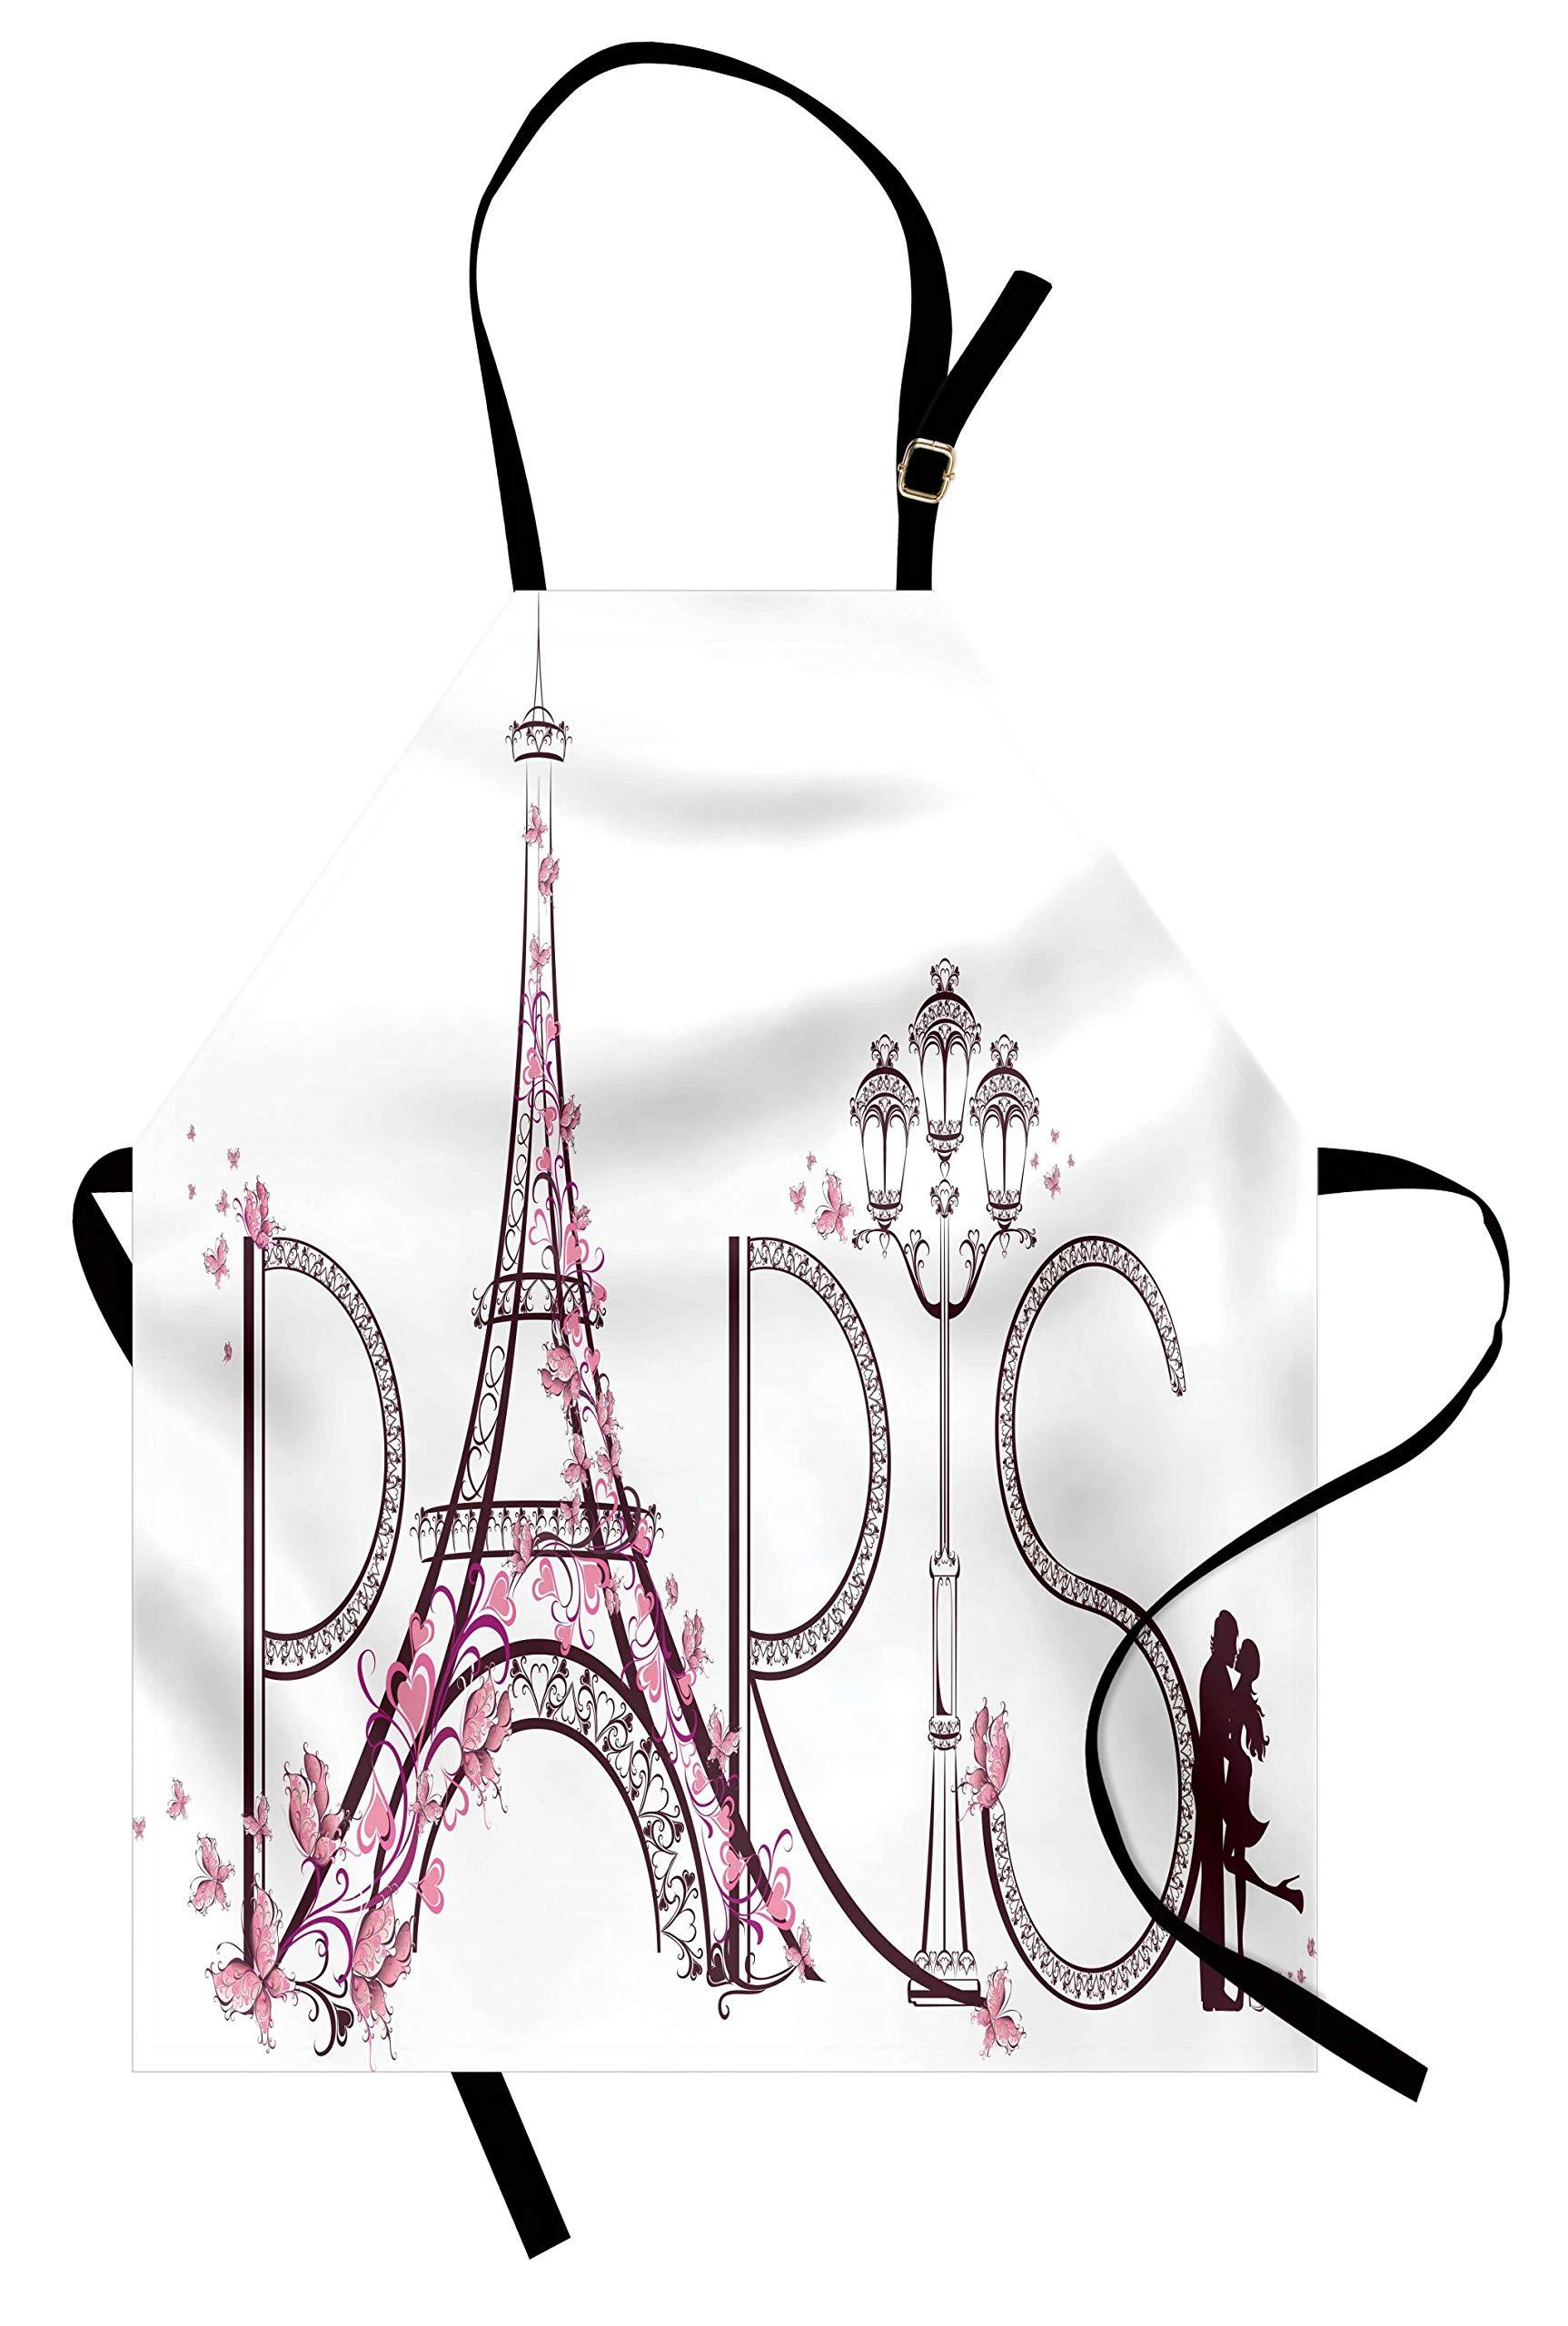 Lunarable Paris Apron, Tower Eiffel with Paris Lettering Couple Trip Flowers Floral Artful Design Print, Unisex Kitchen Bib Apron with Adjustable Neck for Cooking Baking Gardening, Plum Pale Pink